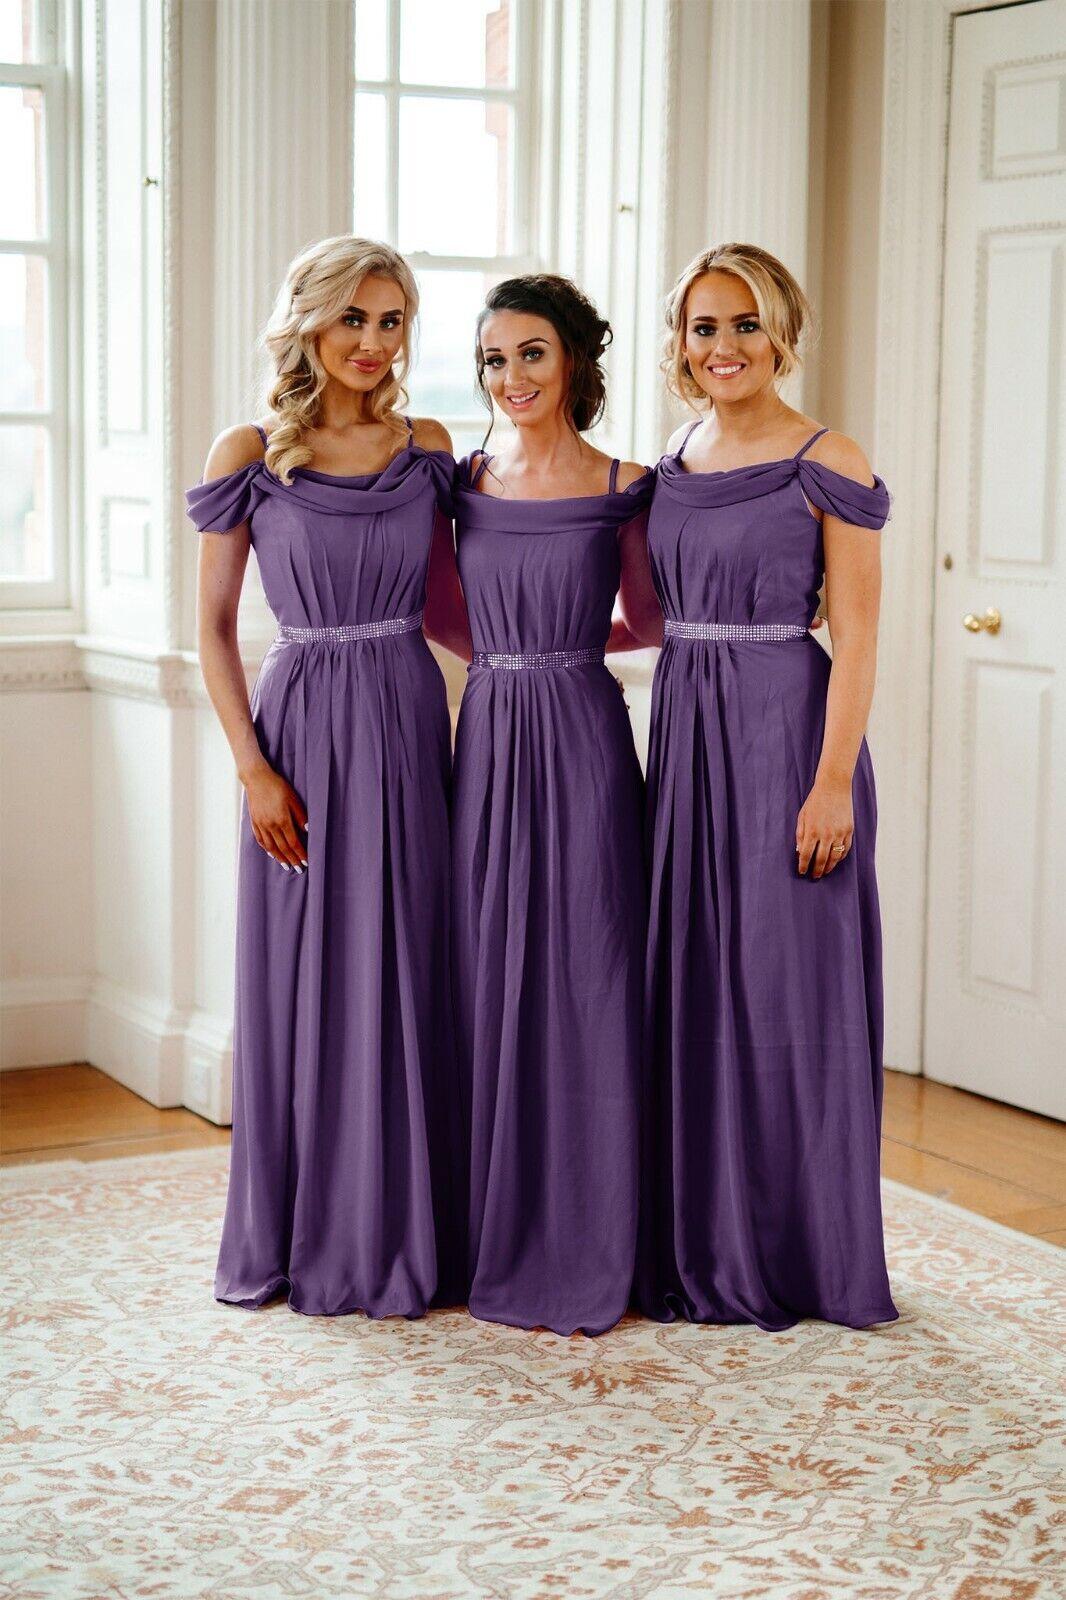 Cadbury Purple Long Bridesmaid Dresses Prom Maxi Formal Evening Gown Uk